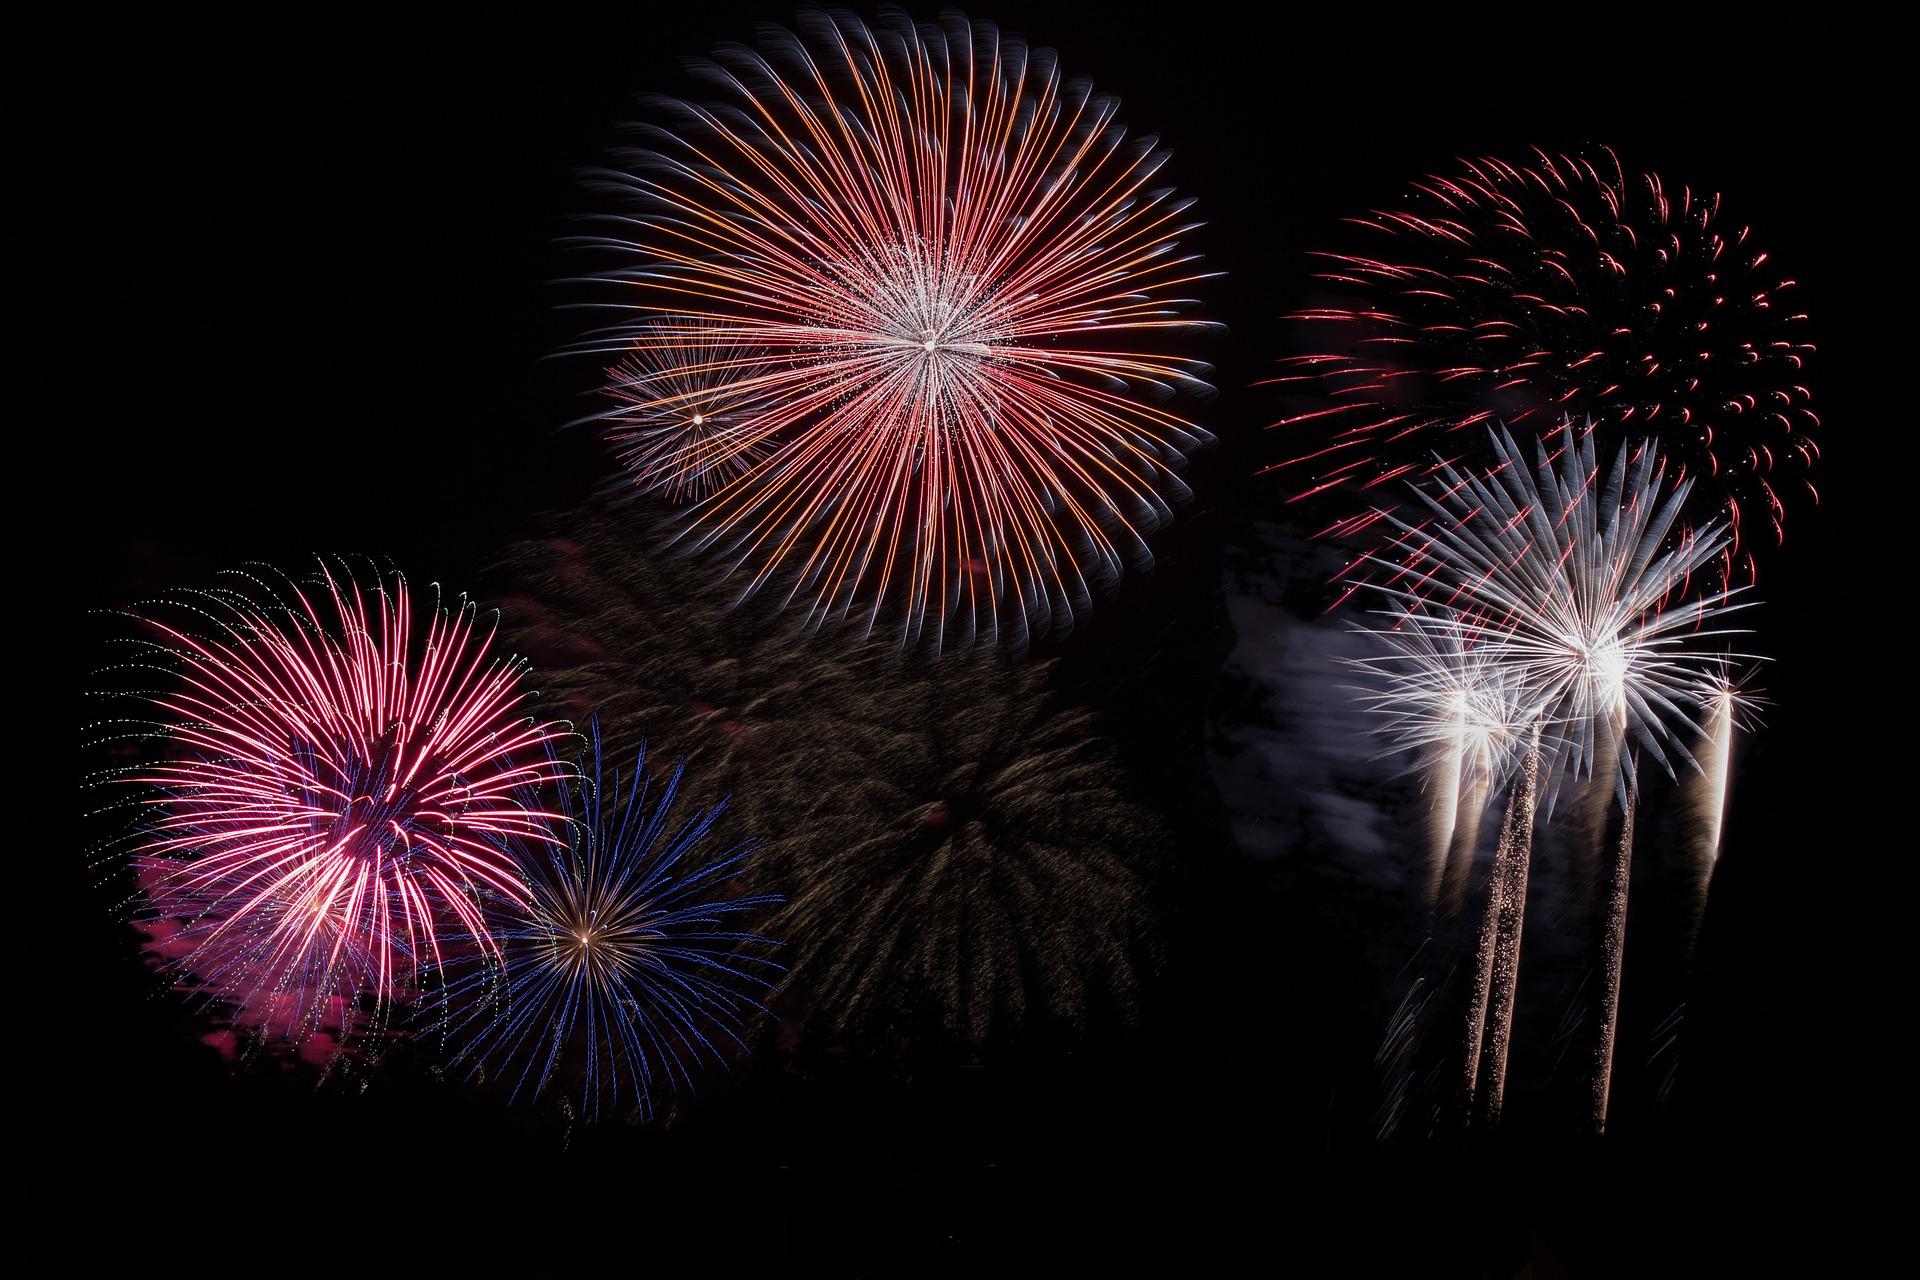 fireworks-879461_1920.jpg